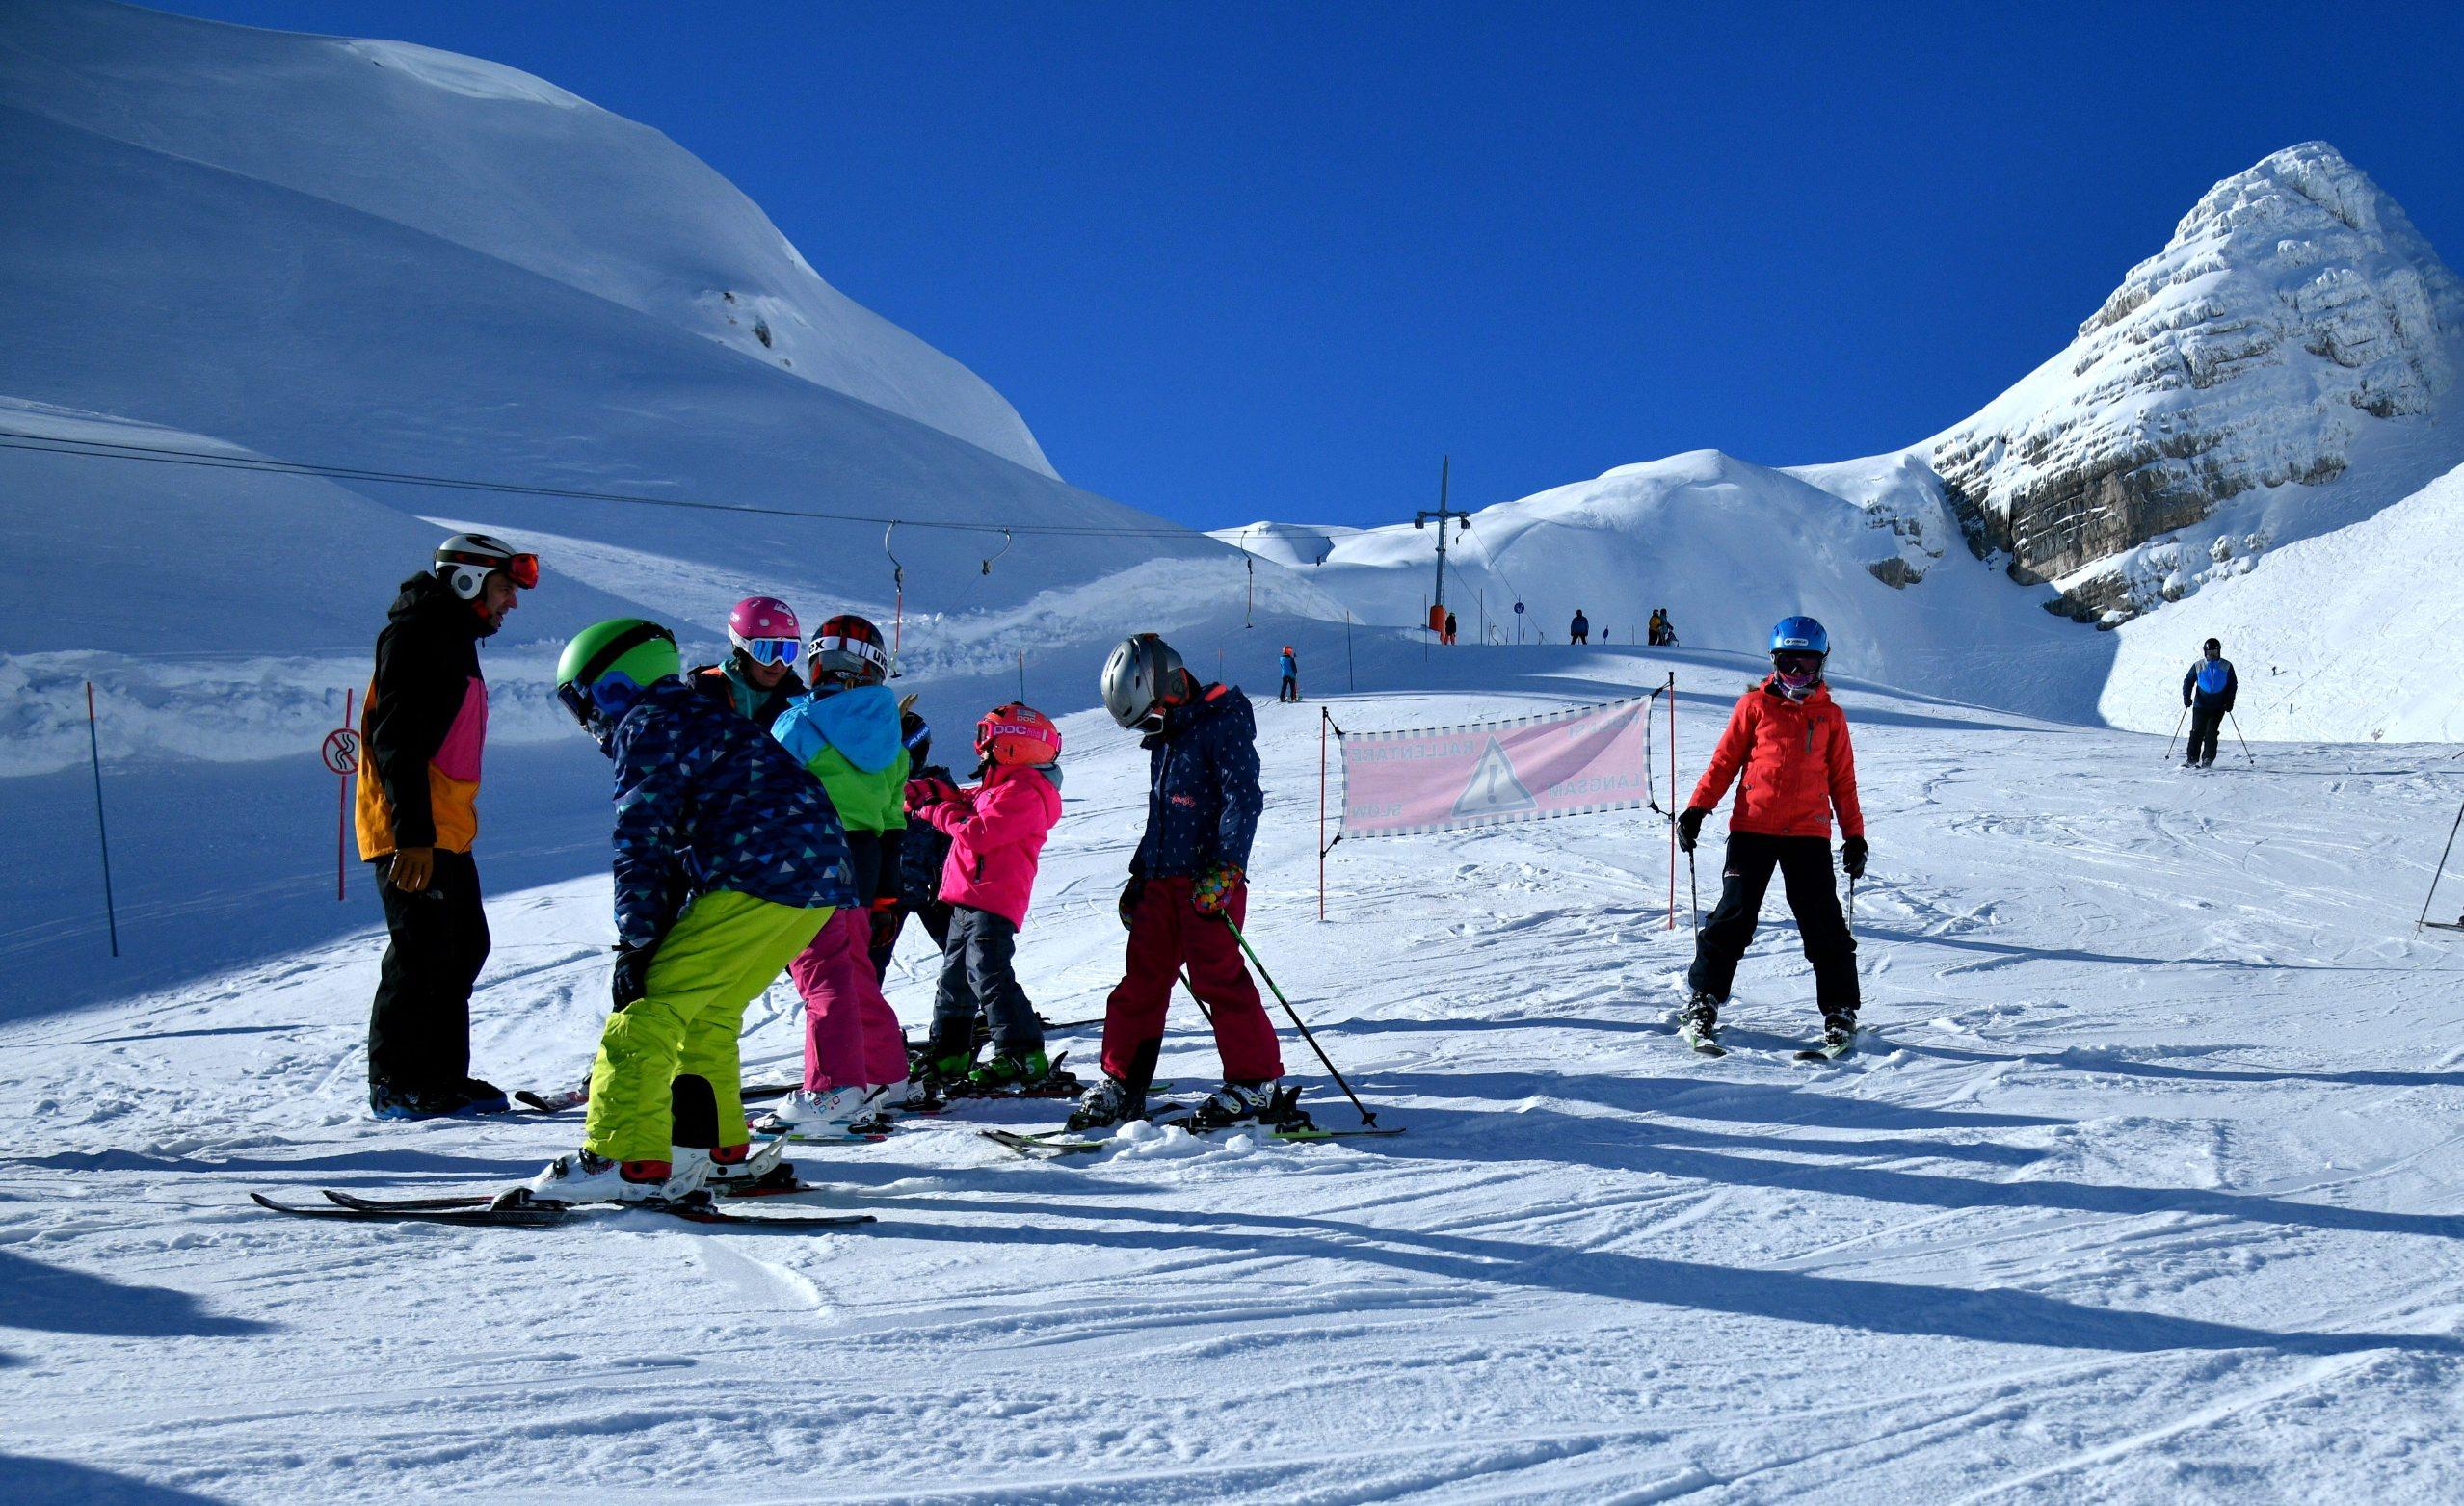 ski_patrola1-020120